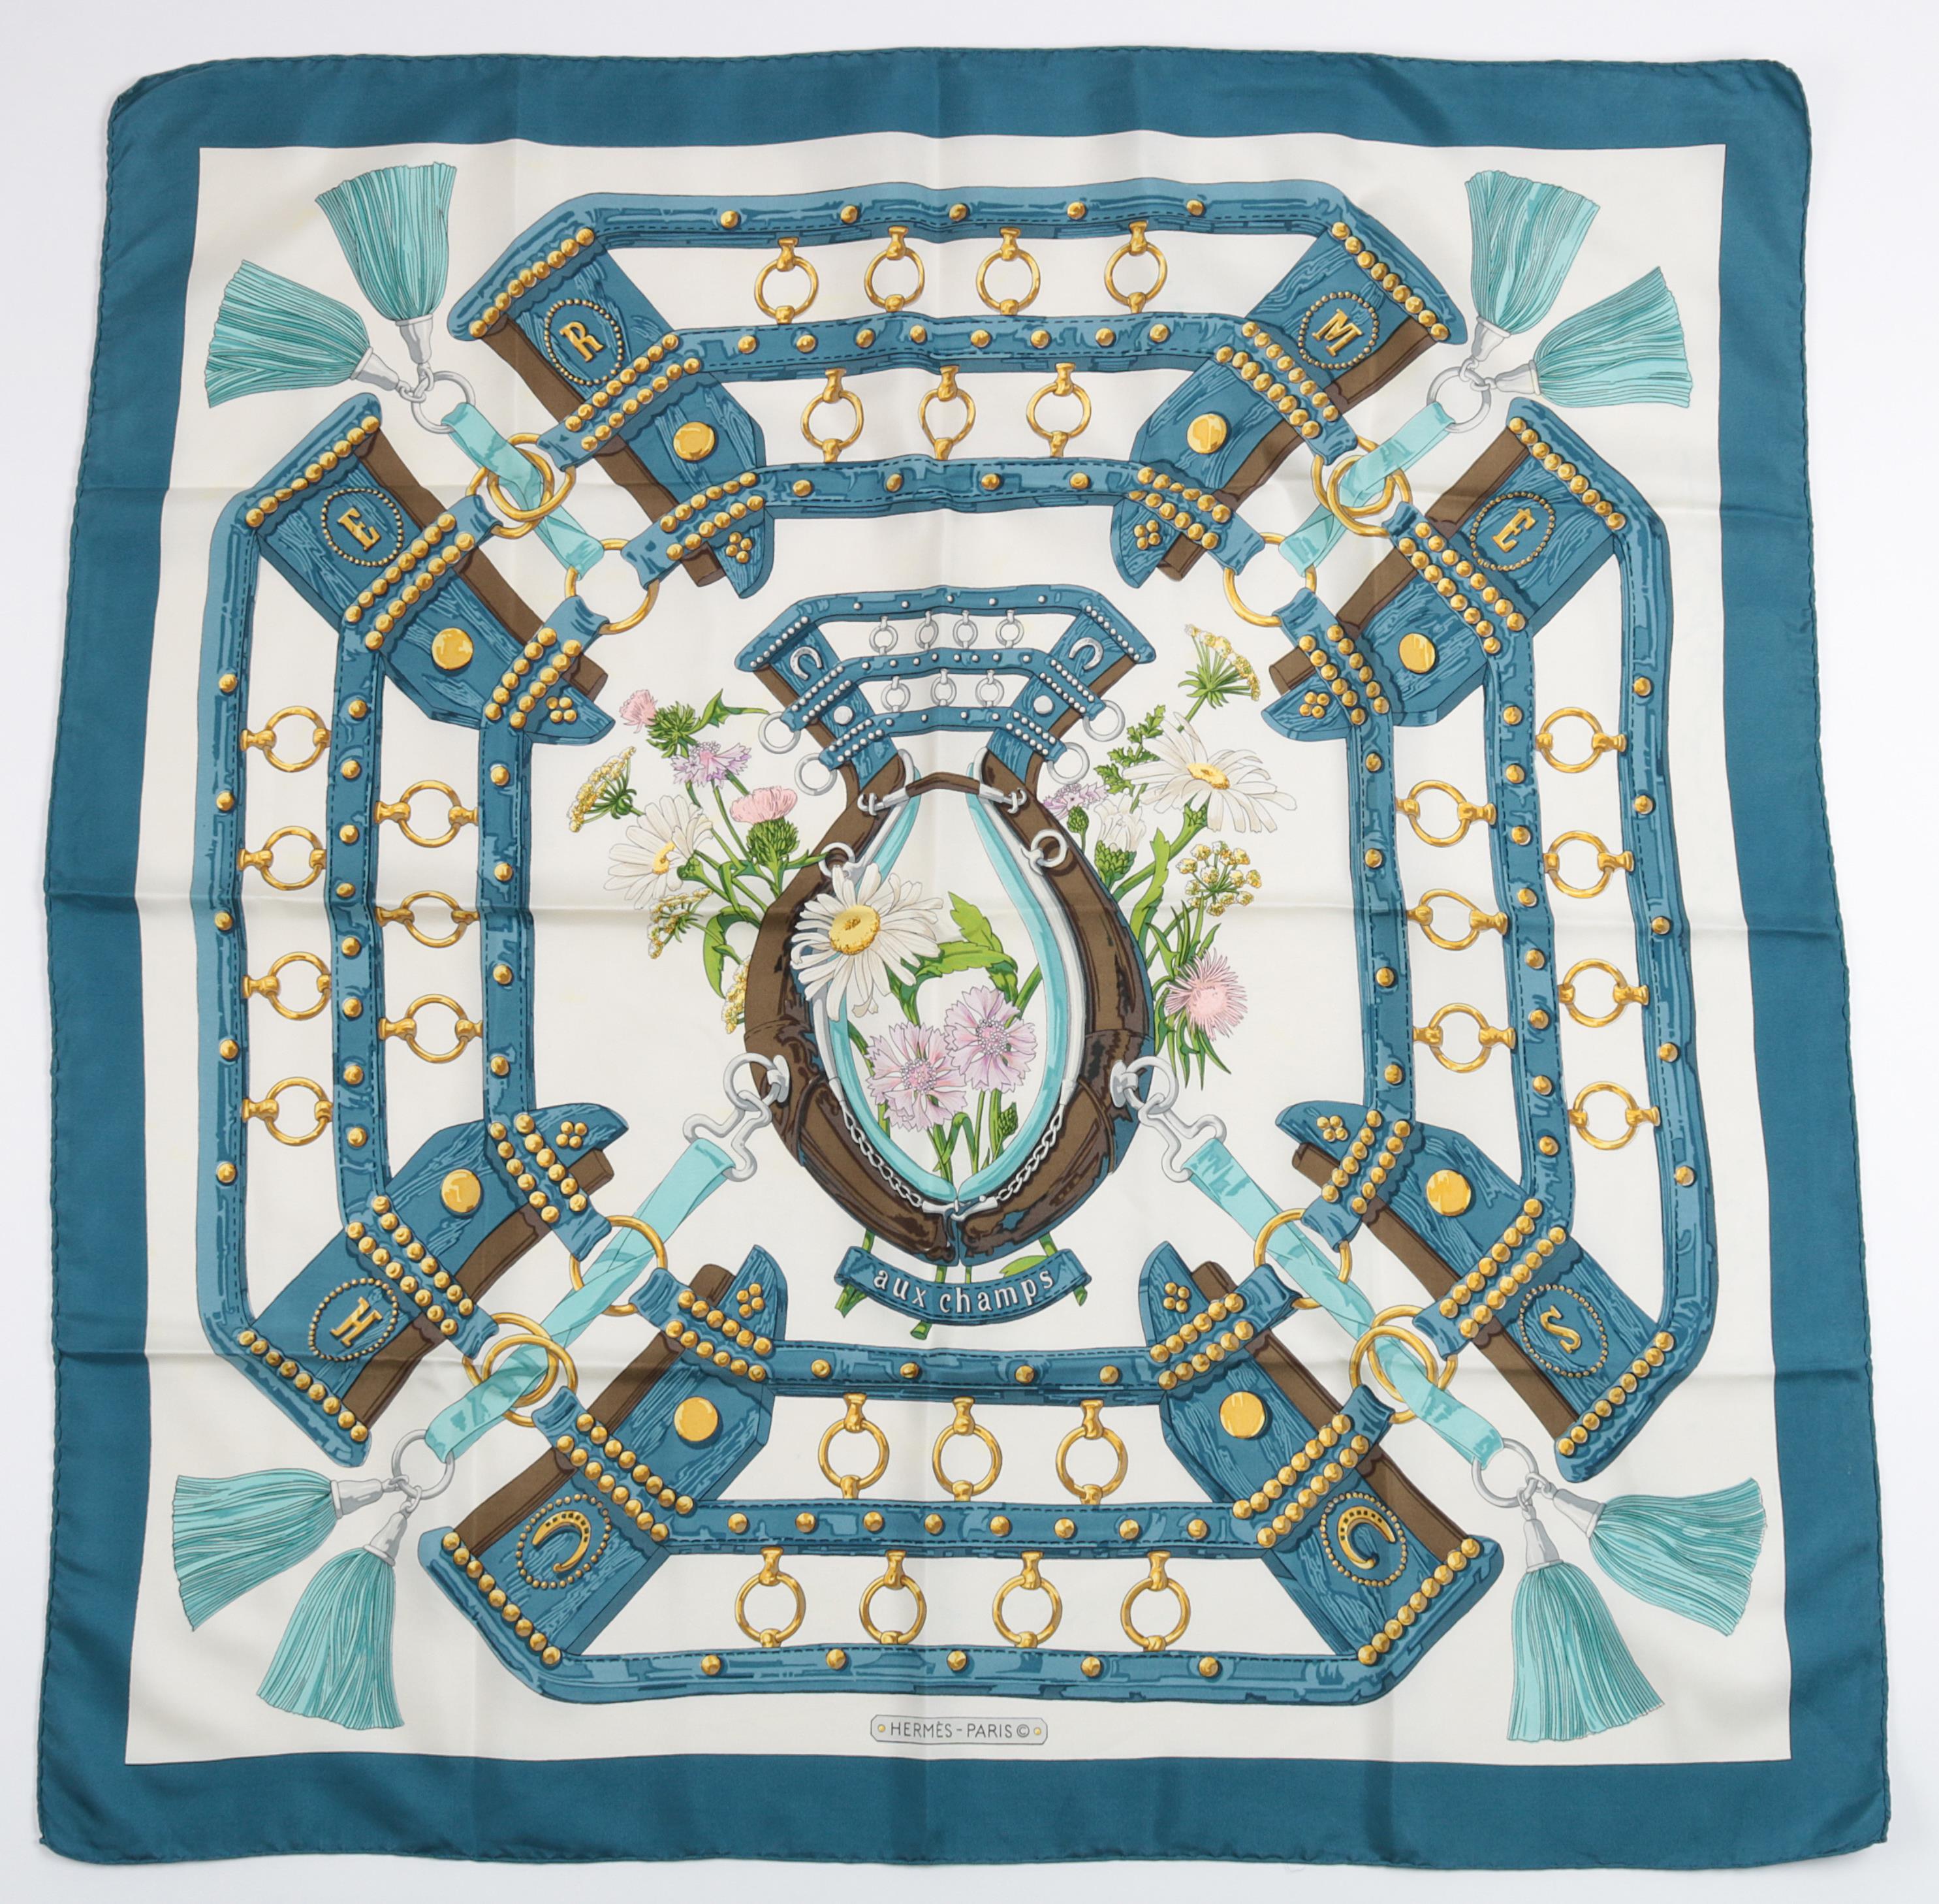 Hermès scarf 'Aux Champs', designed by Cathy Latham in 1970, silk, approx. 89 x 89 cm, starting bid €180